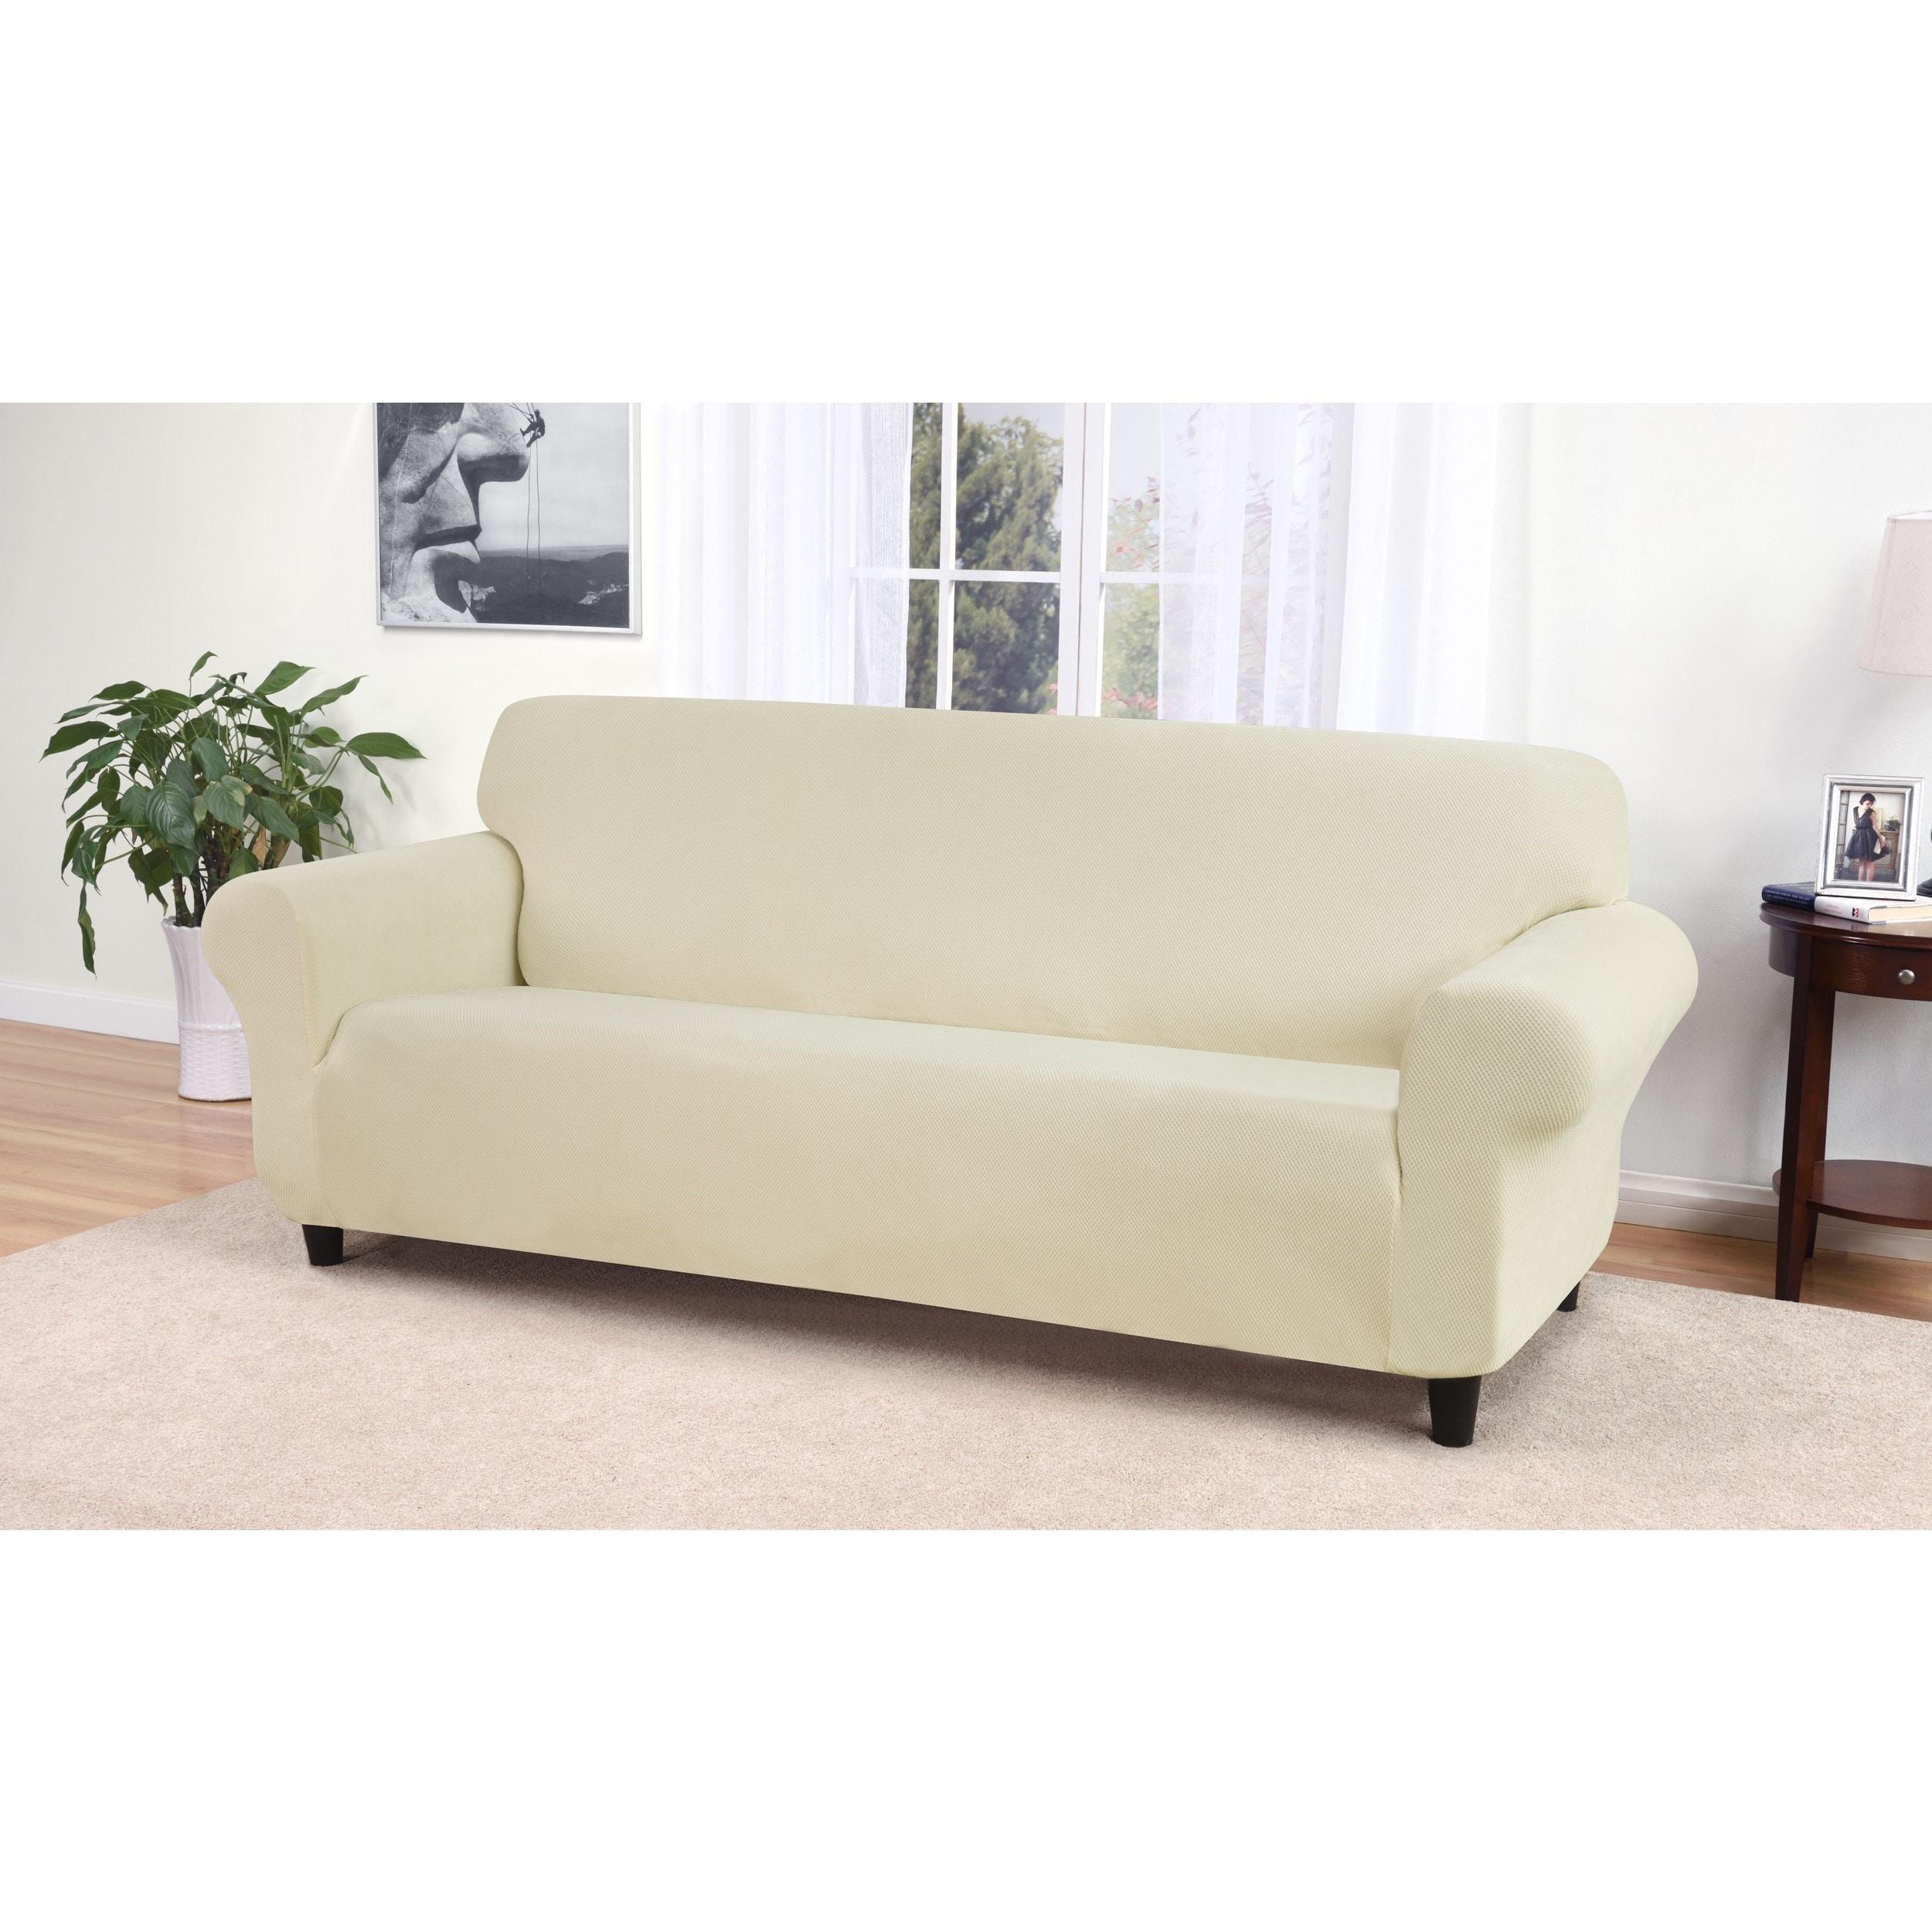 https://ak1.ostkcdn.com//images/products/14046727/kathy-ireland-Day-Break-Sofa-Slipcover-8bd20e04-cbe2-4016-8993-6a335fee89a8.jpg